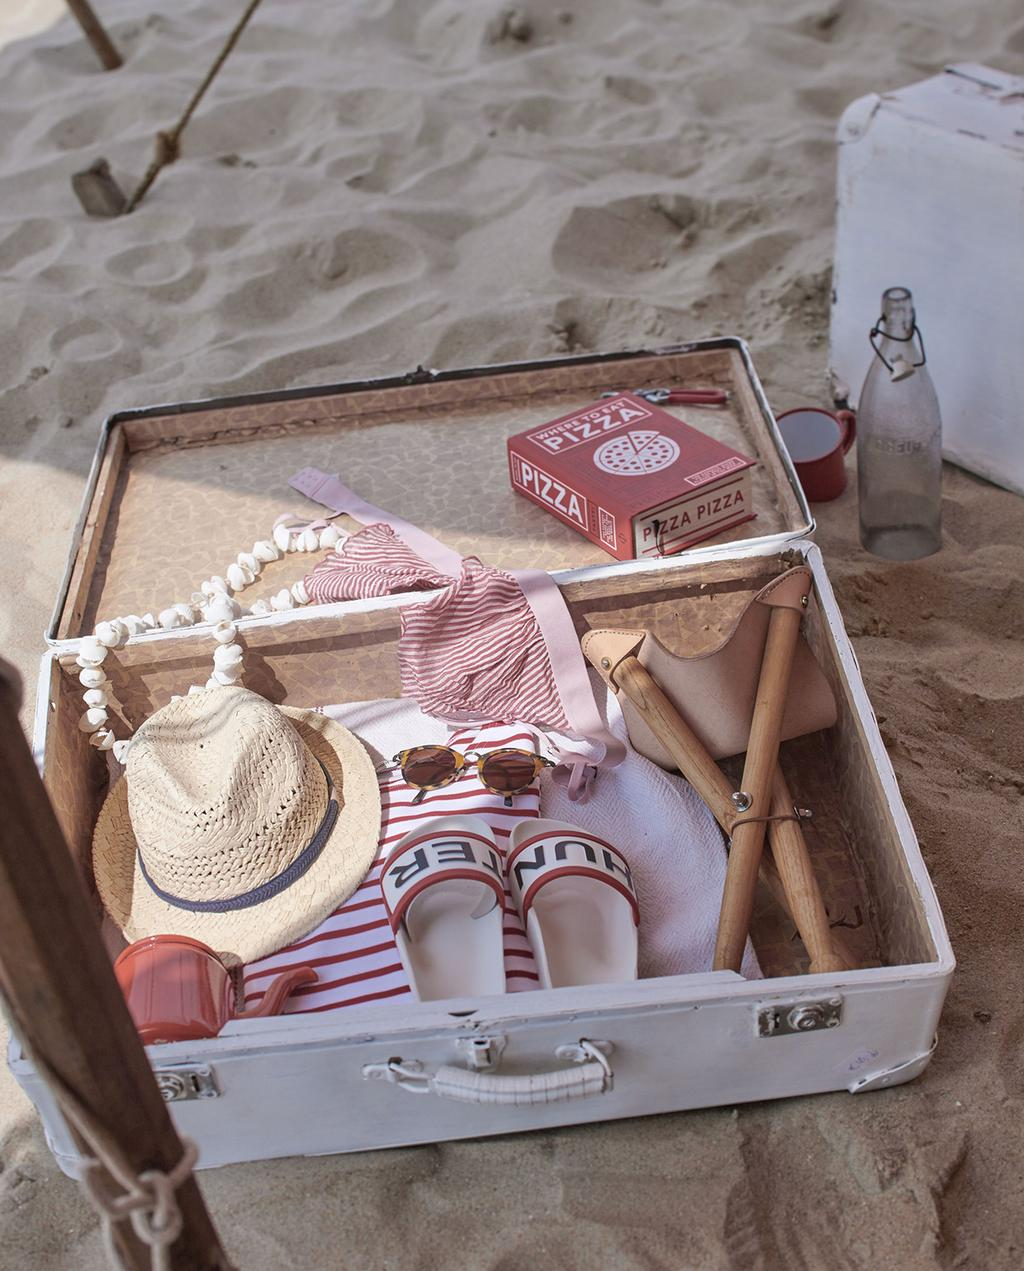 vtwonen 08-2016 | witte koffer met rood wit gestreepte kleding